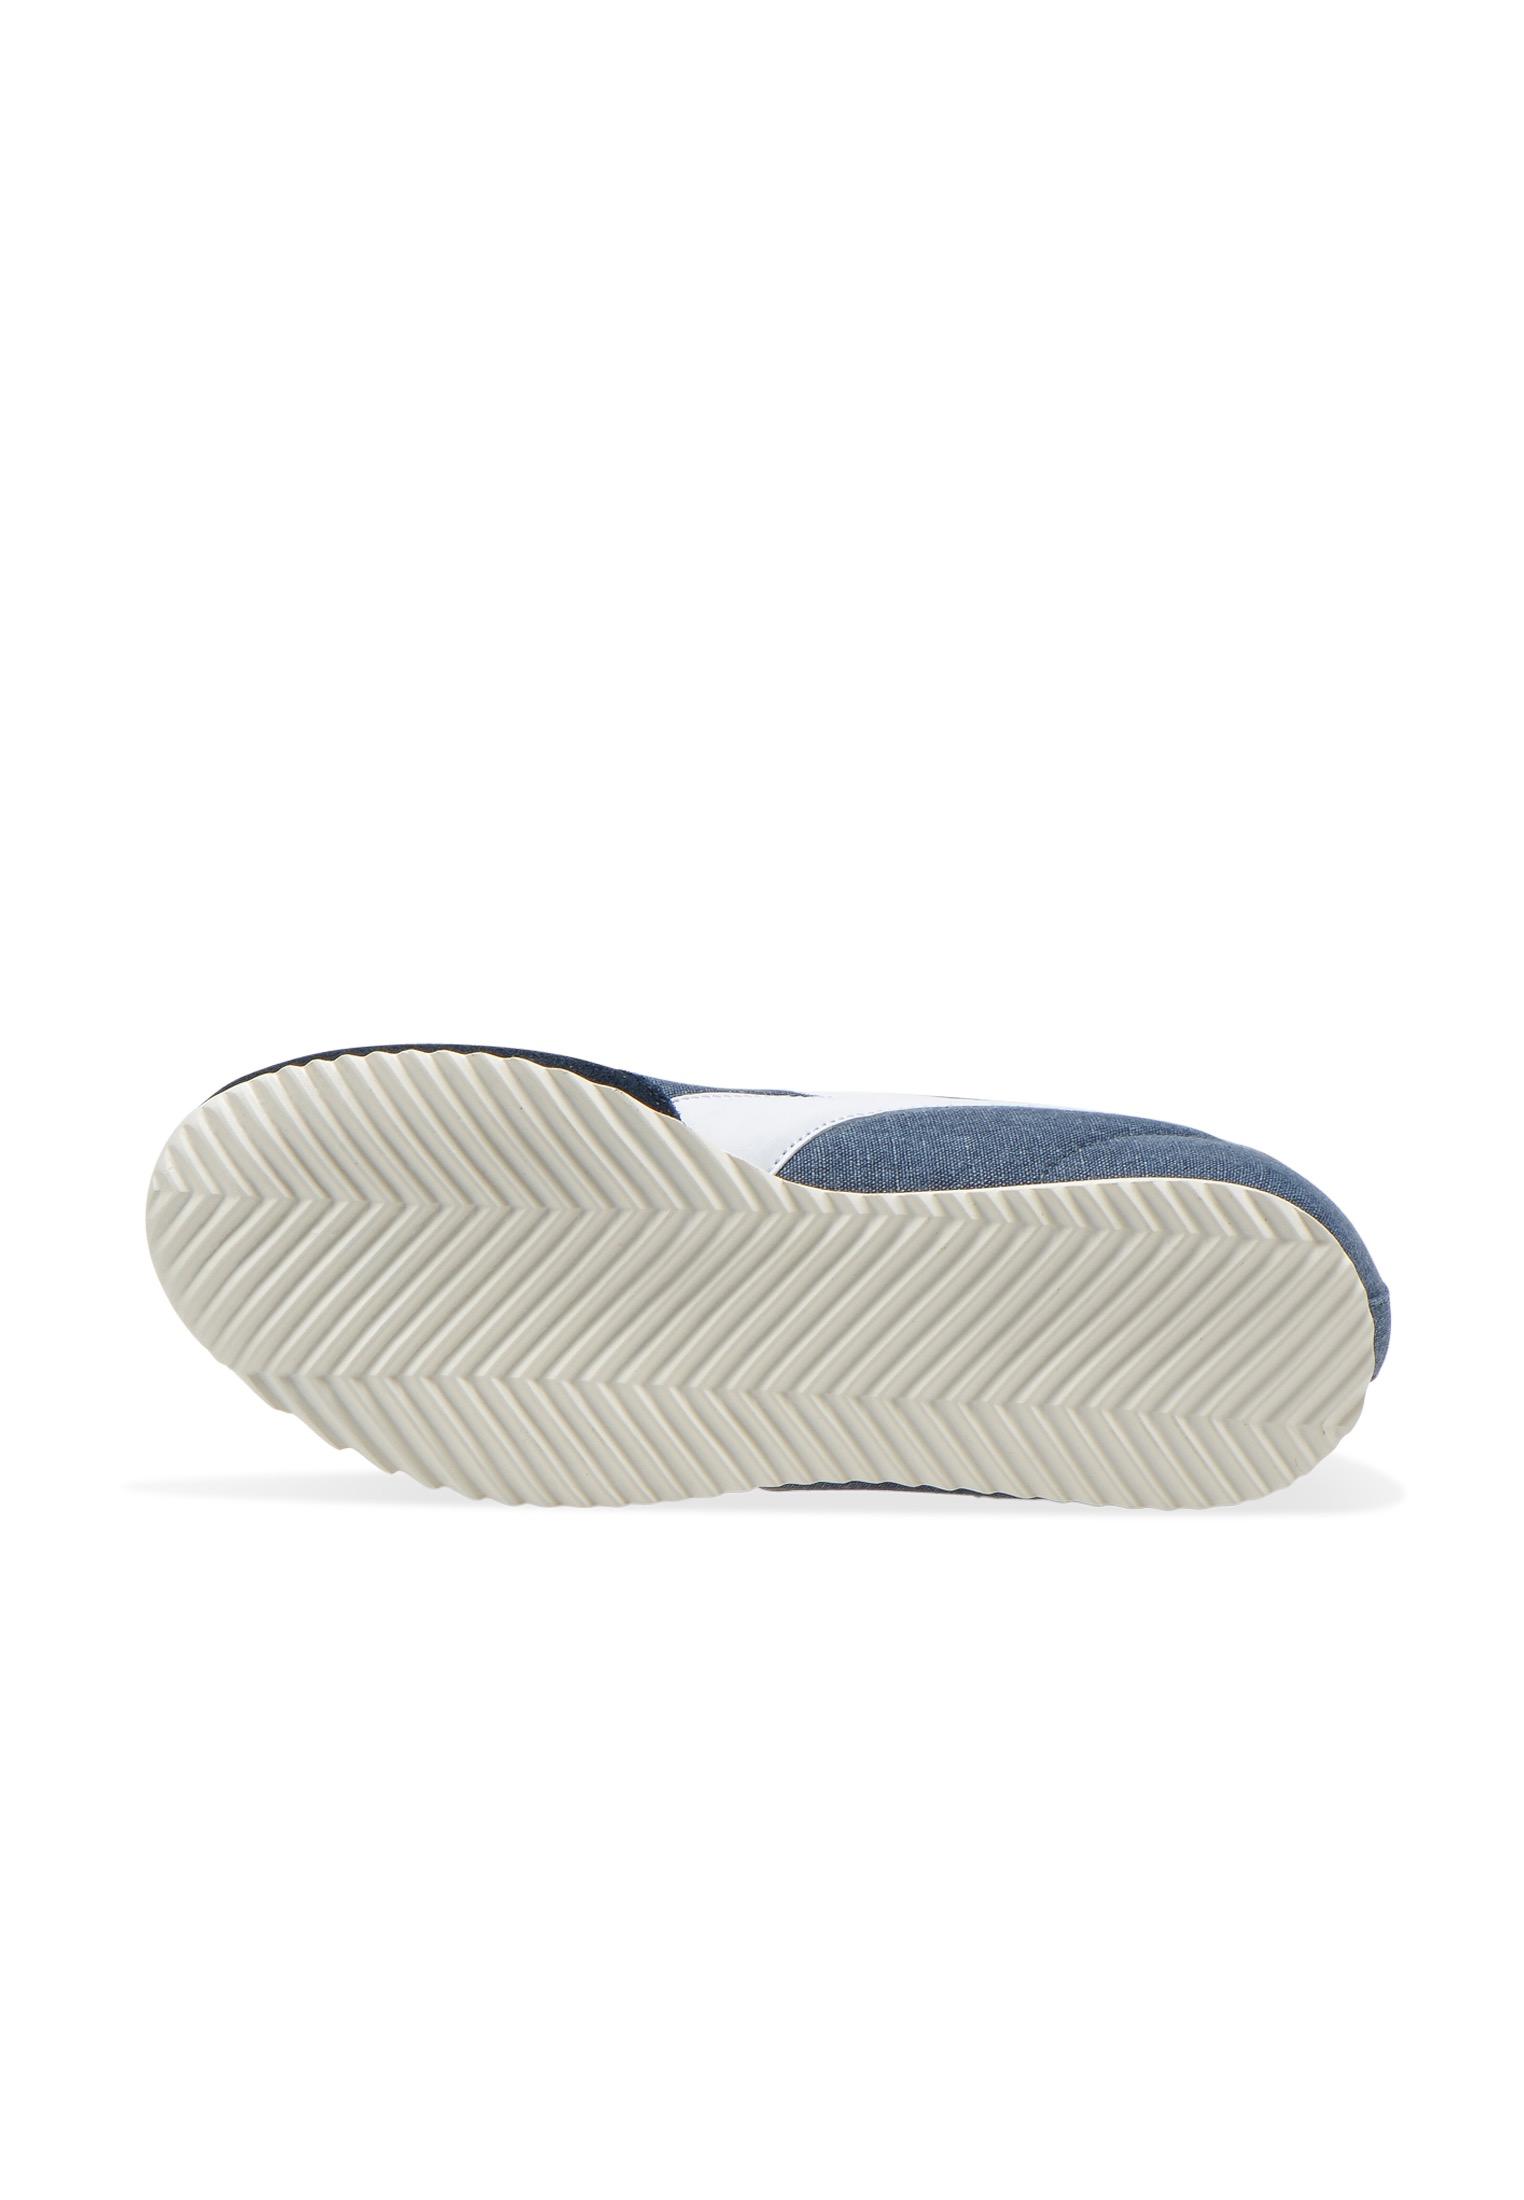 Scarpe-Diadora-Jog-Light-C-Sneakers-sportive-uomo-donna-vari-colori-e-taglie miniatura 52